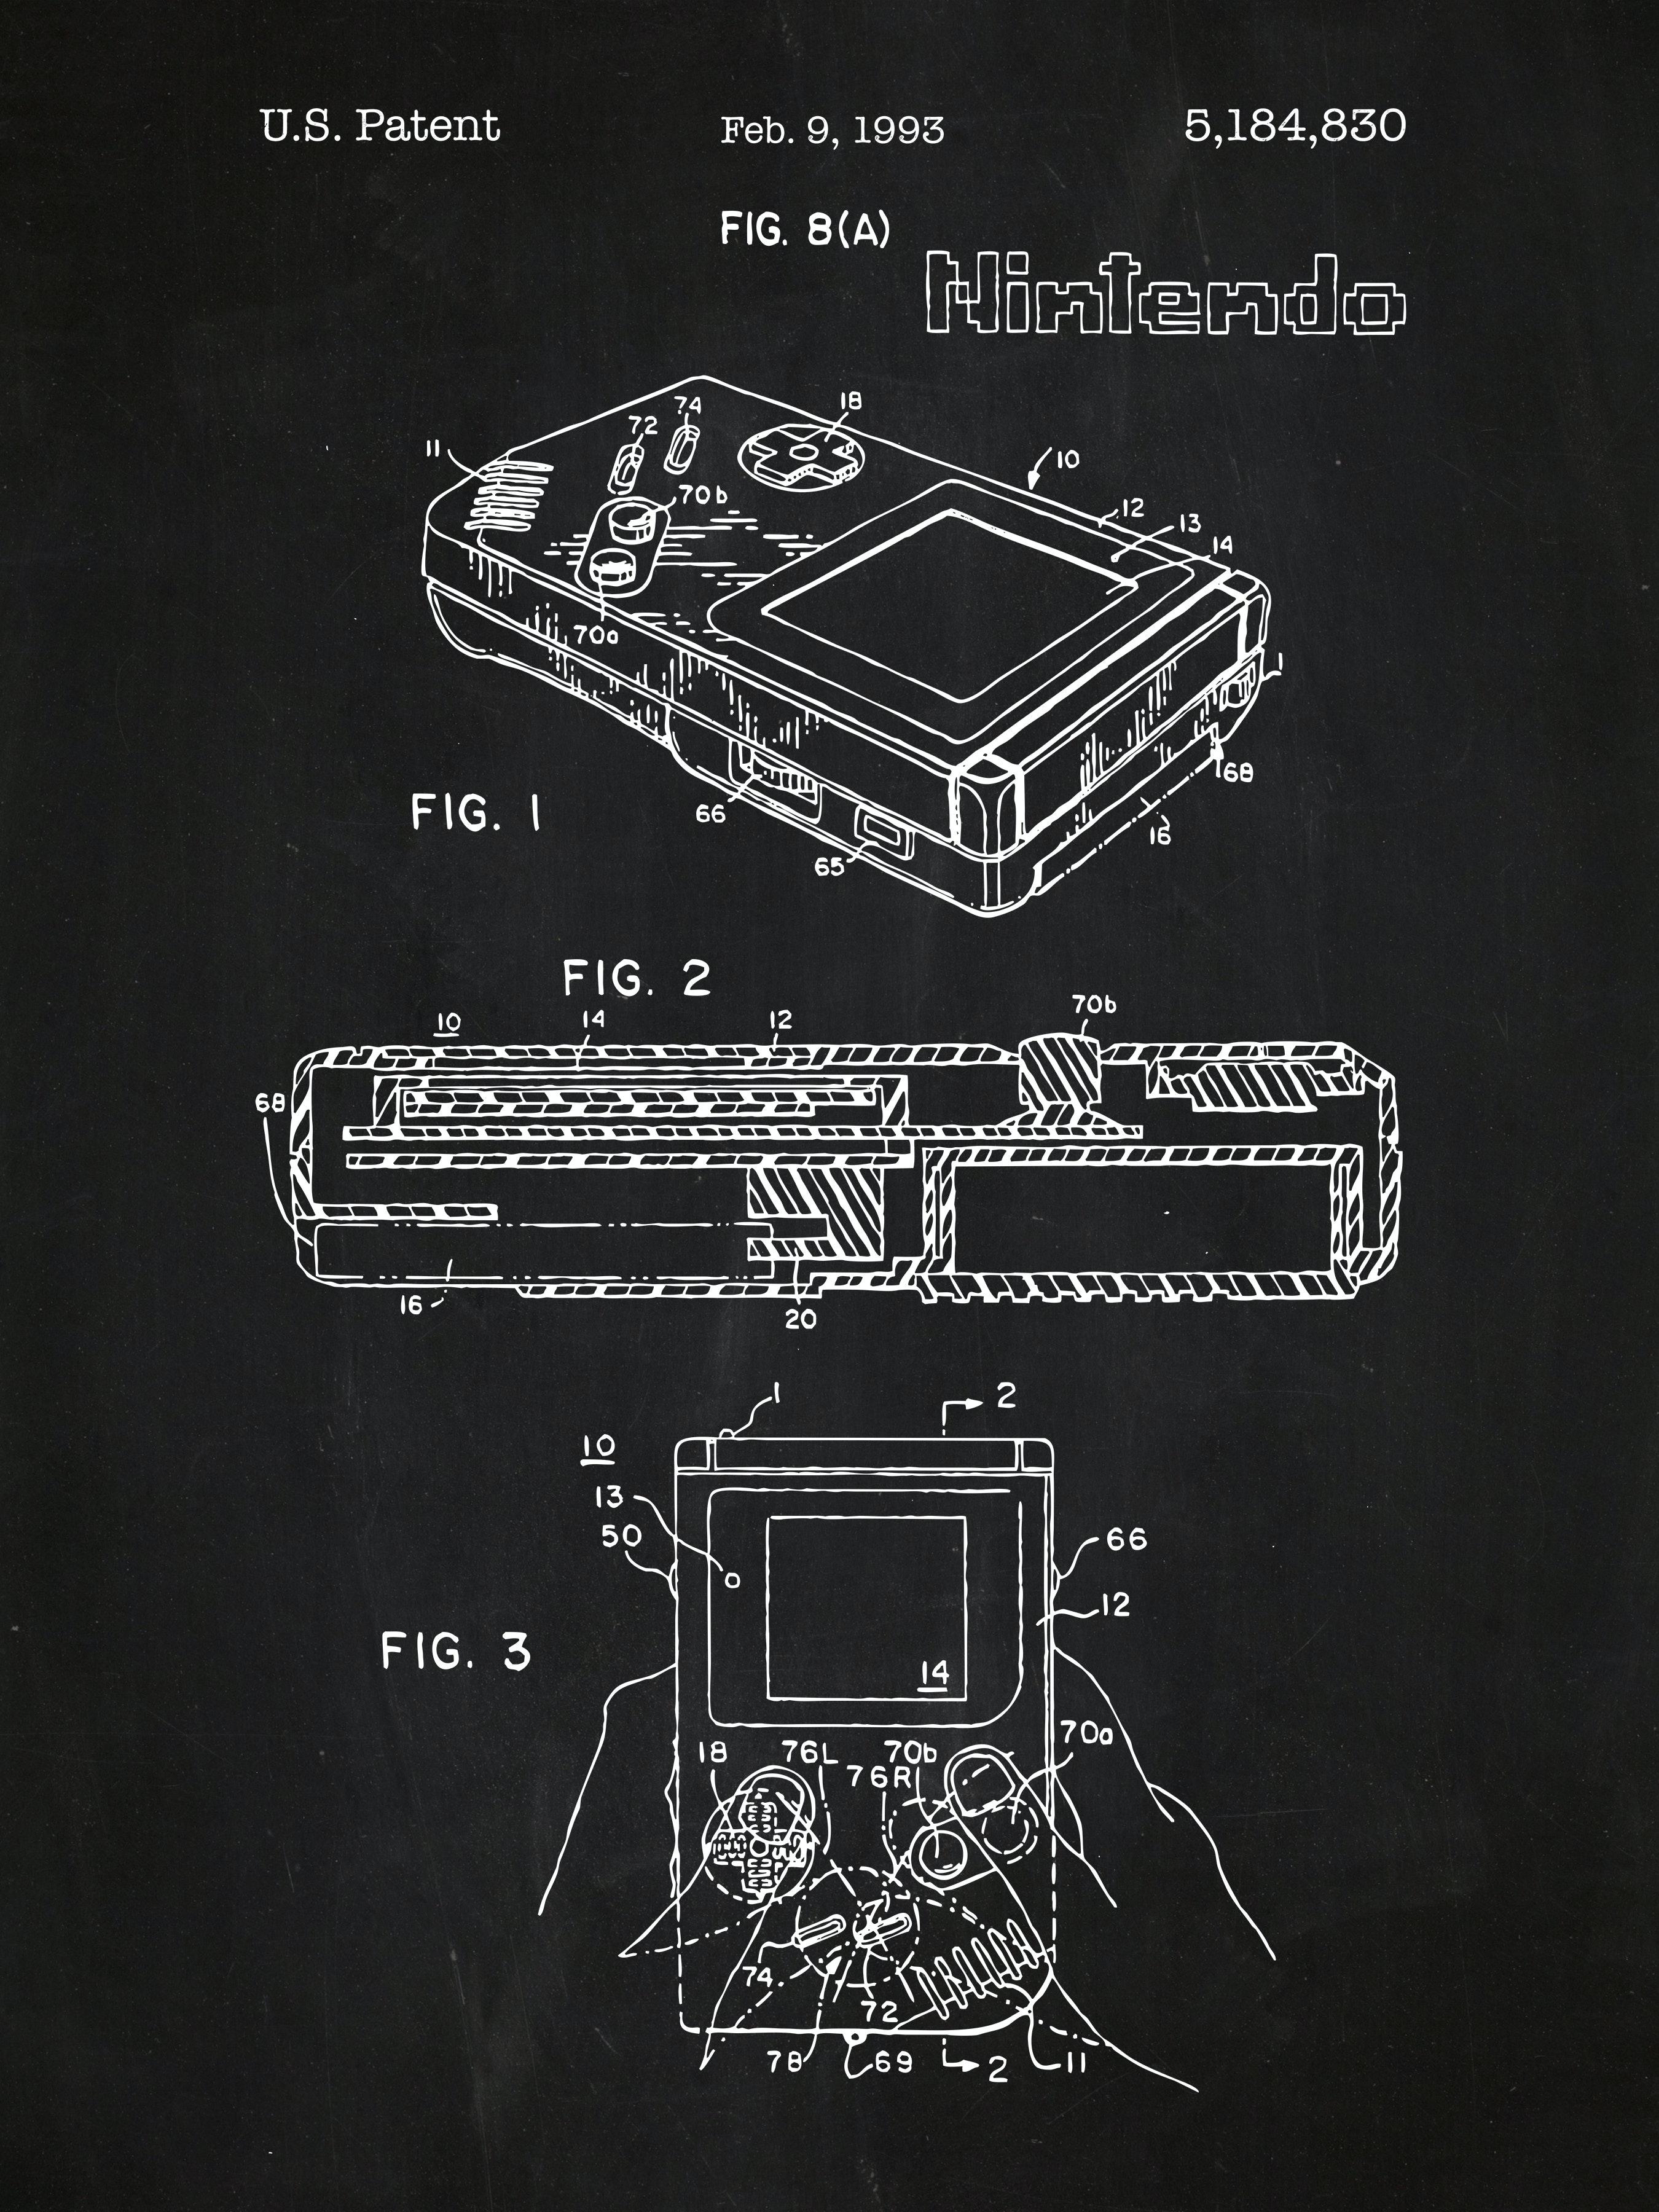 Nintendo Gameboy - 1993 - 5,184,830